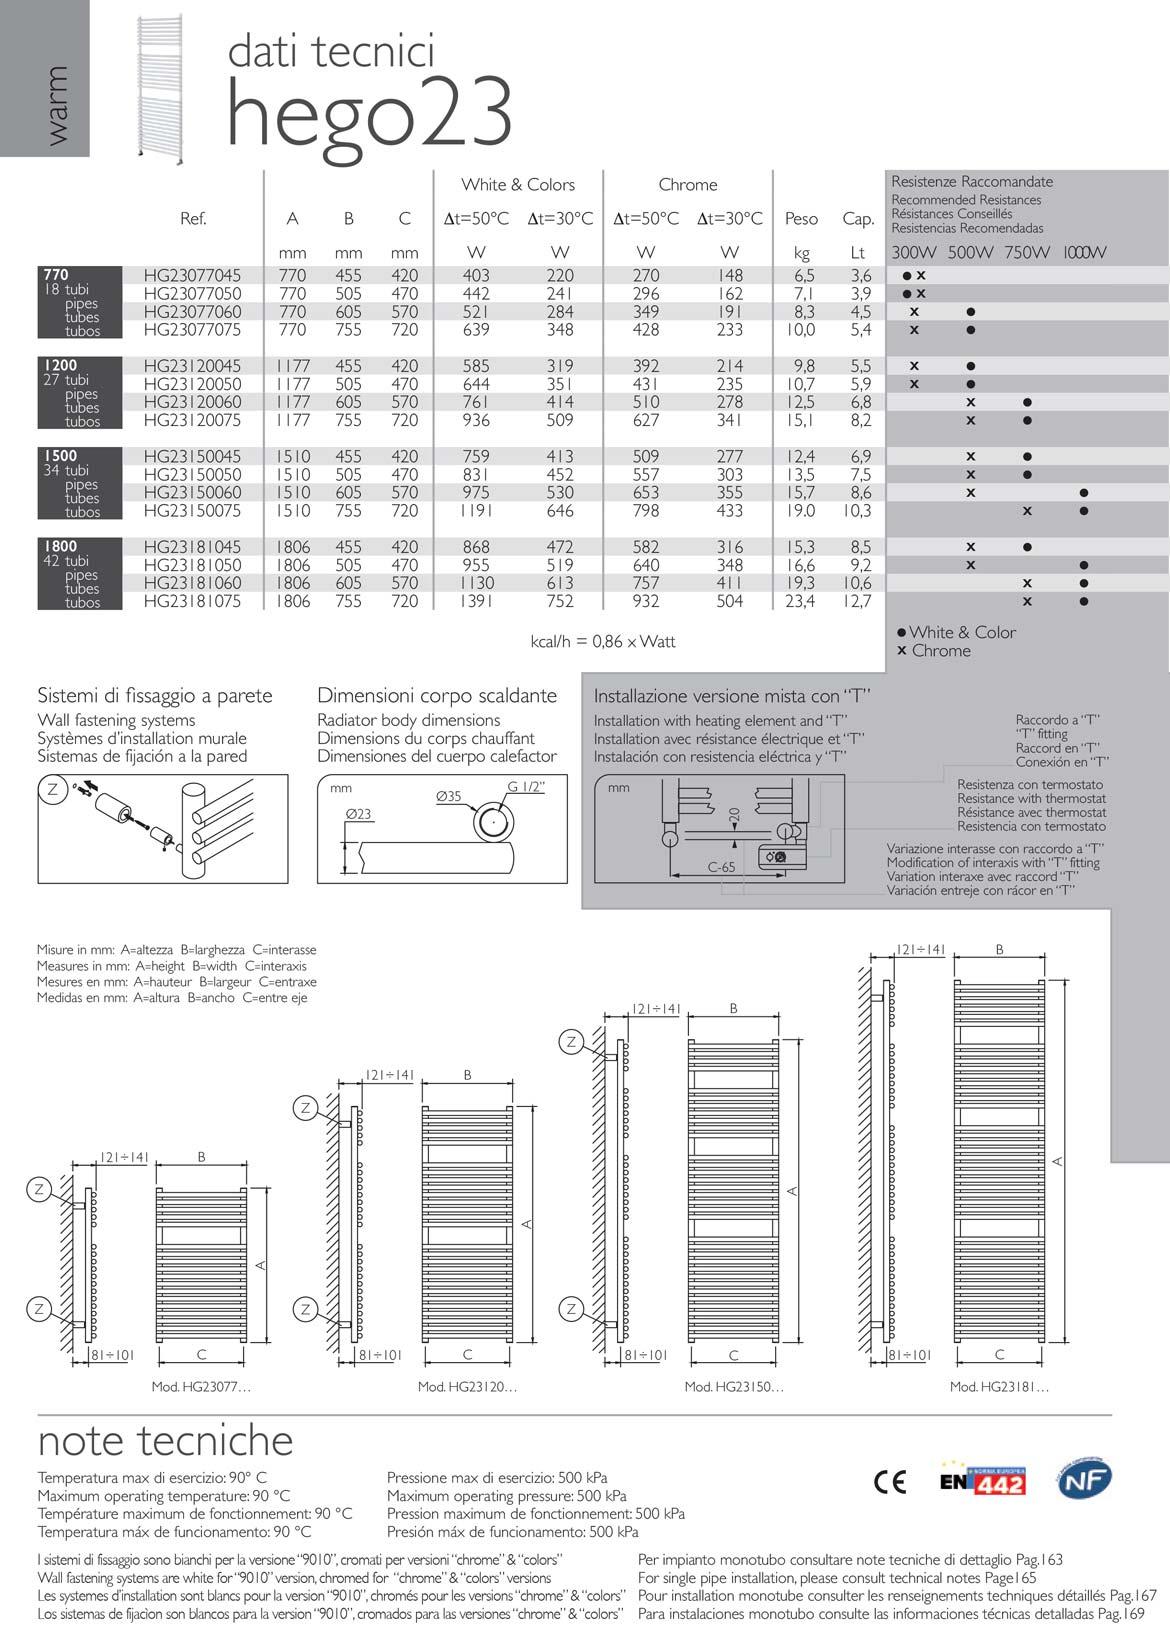 technisches datenblatt-handtuchwärmer-hego-23-deltacalor